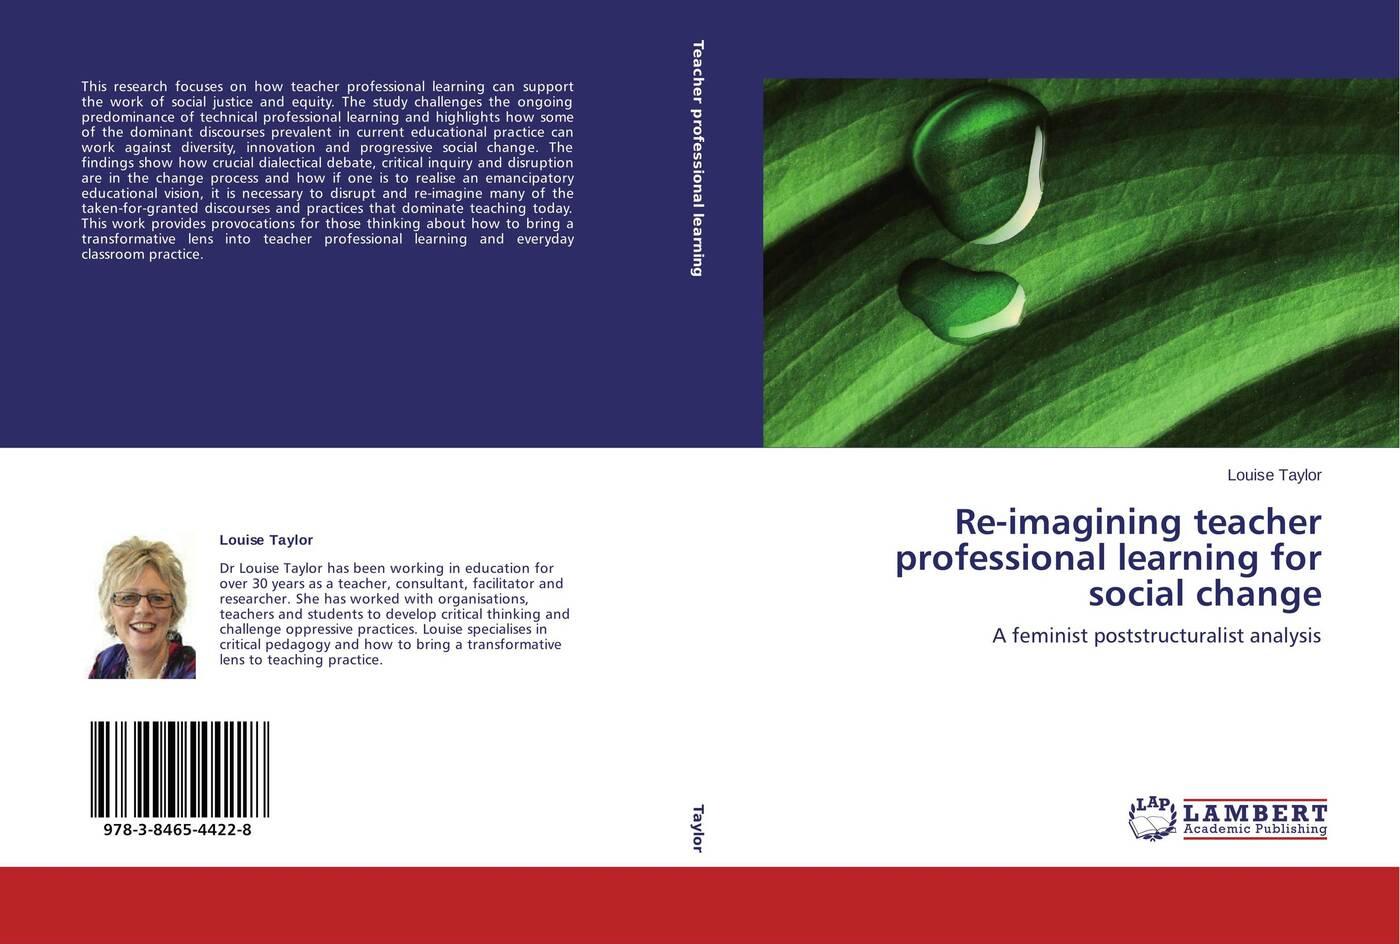 Louise Taylor Re-imagining teacher professional learning for social change re imagining teacher professional learning for social change